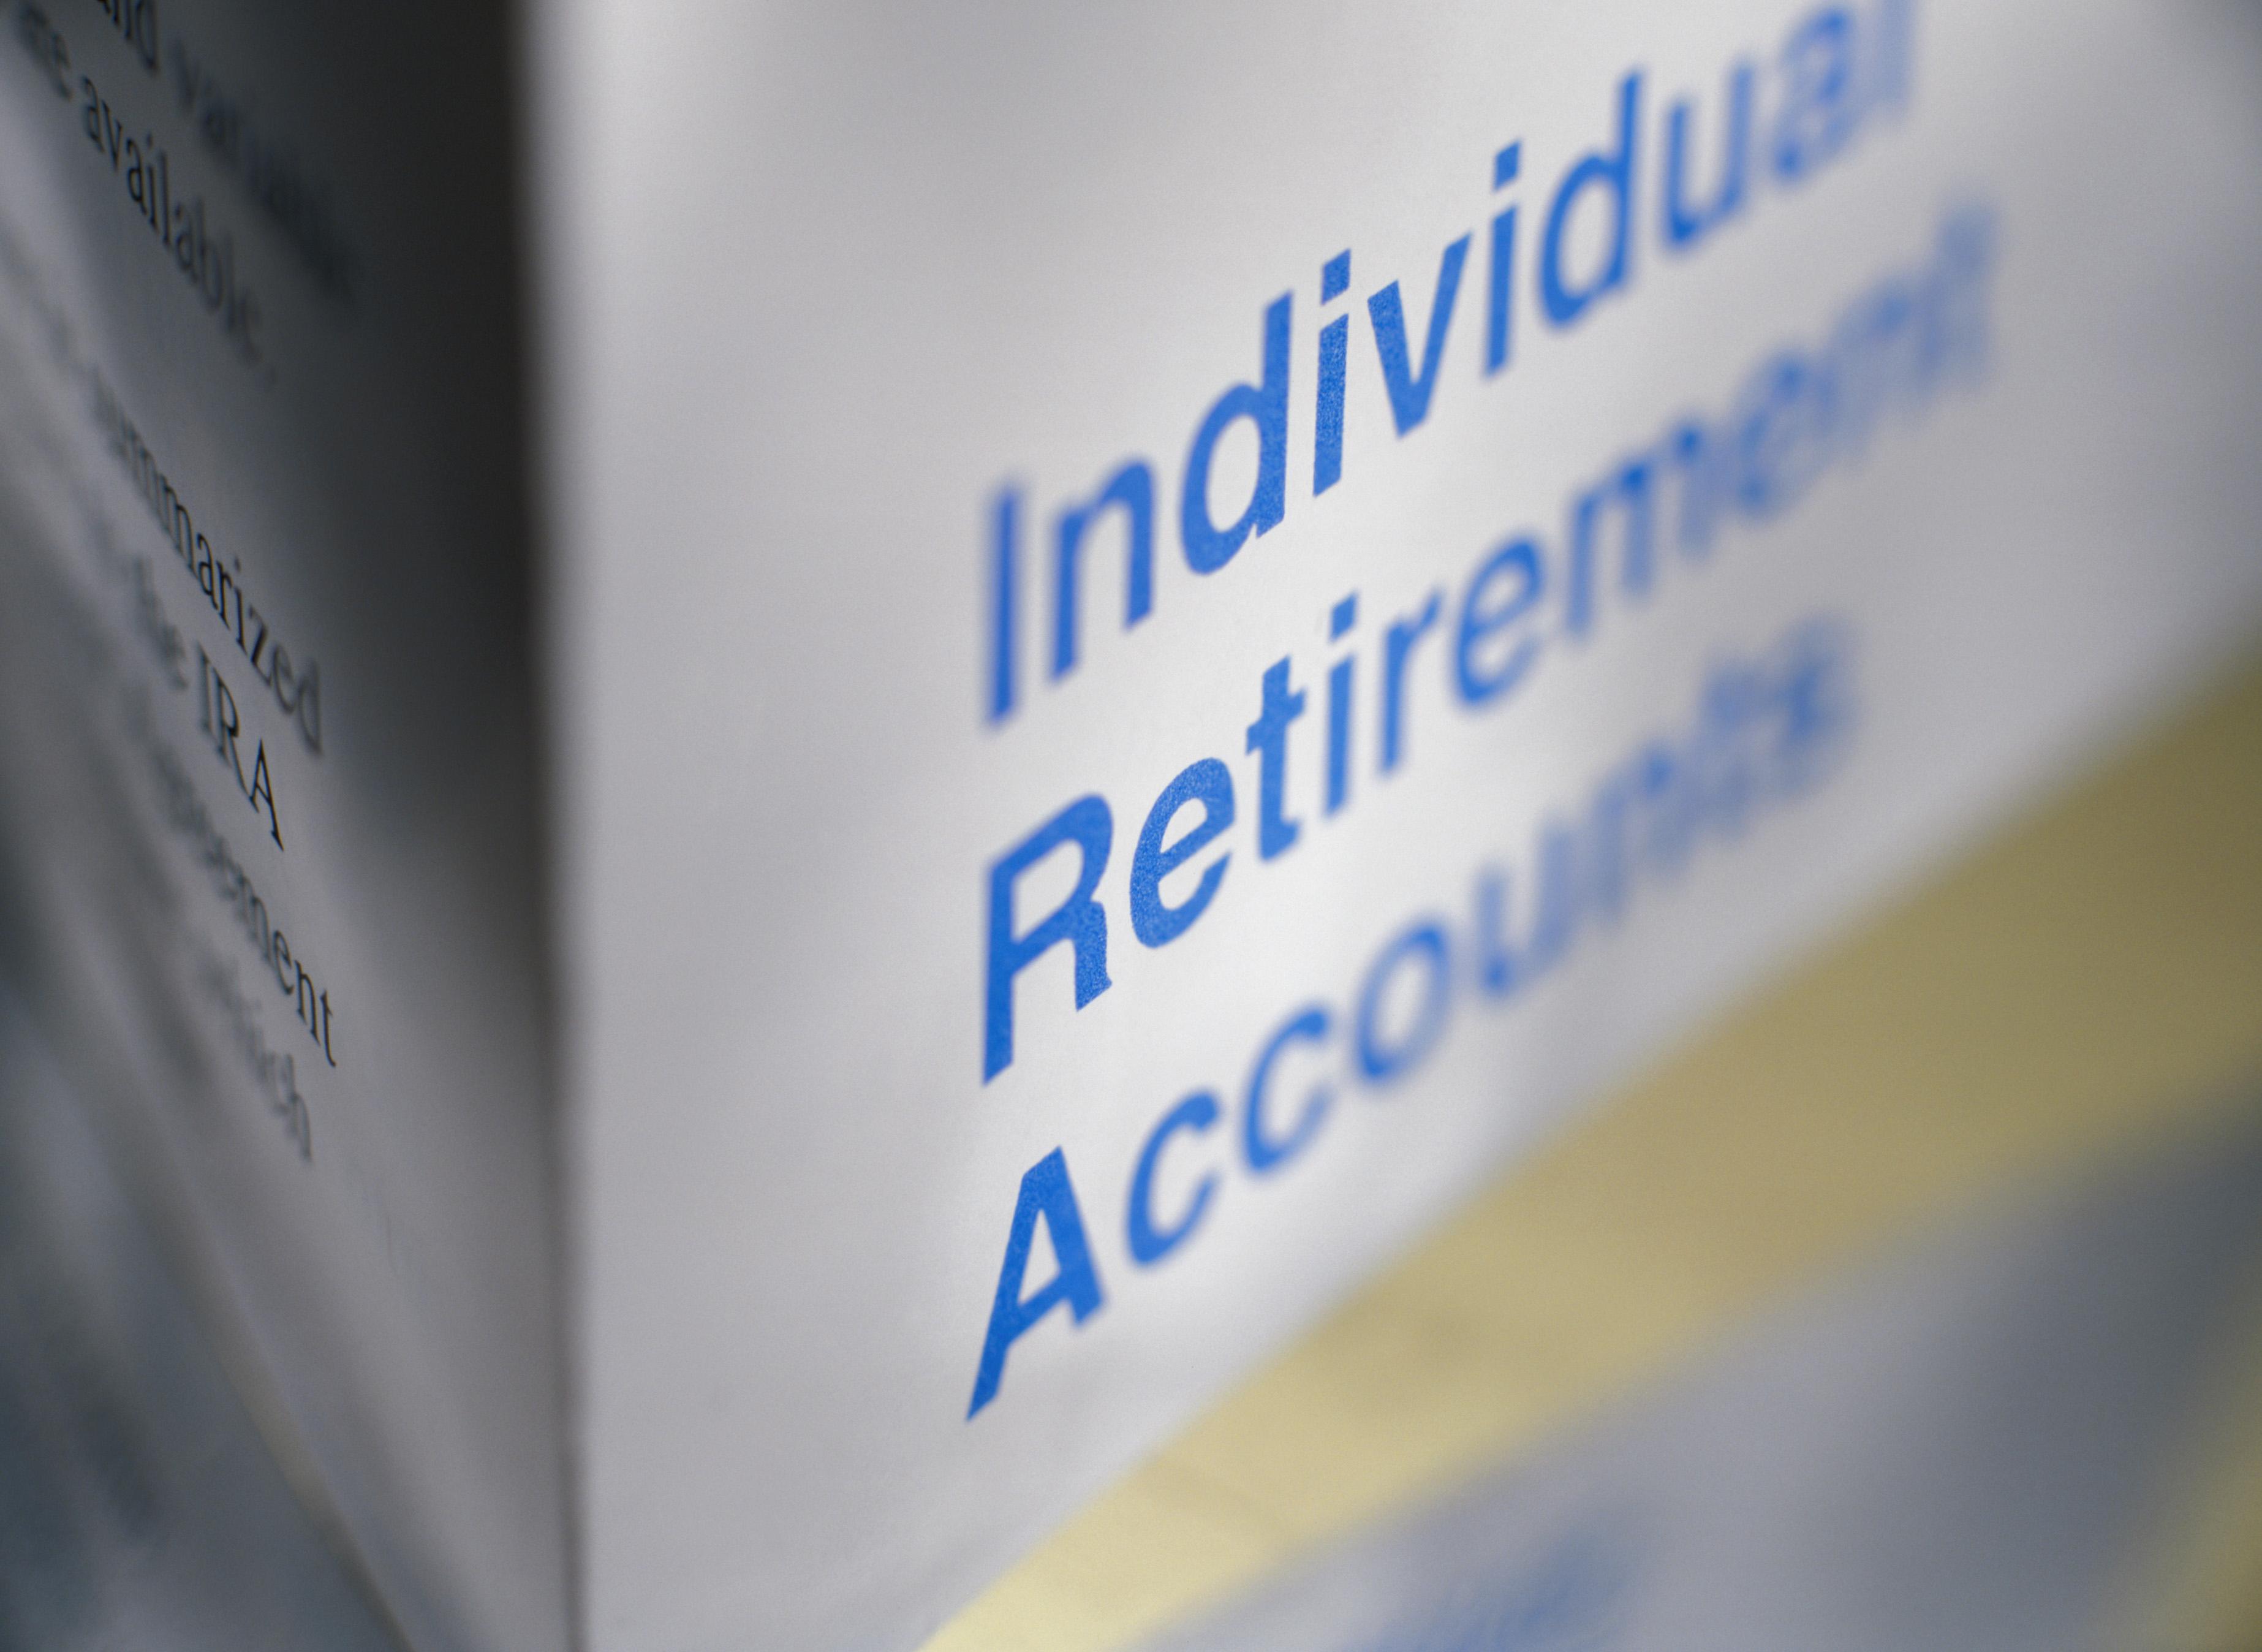 Individual Retirement Account poster.